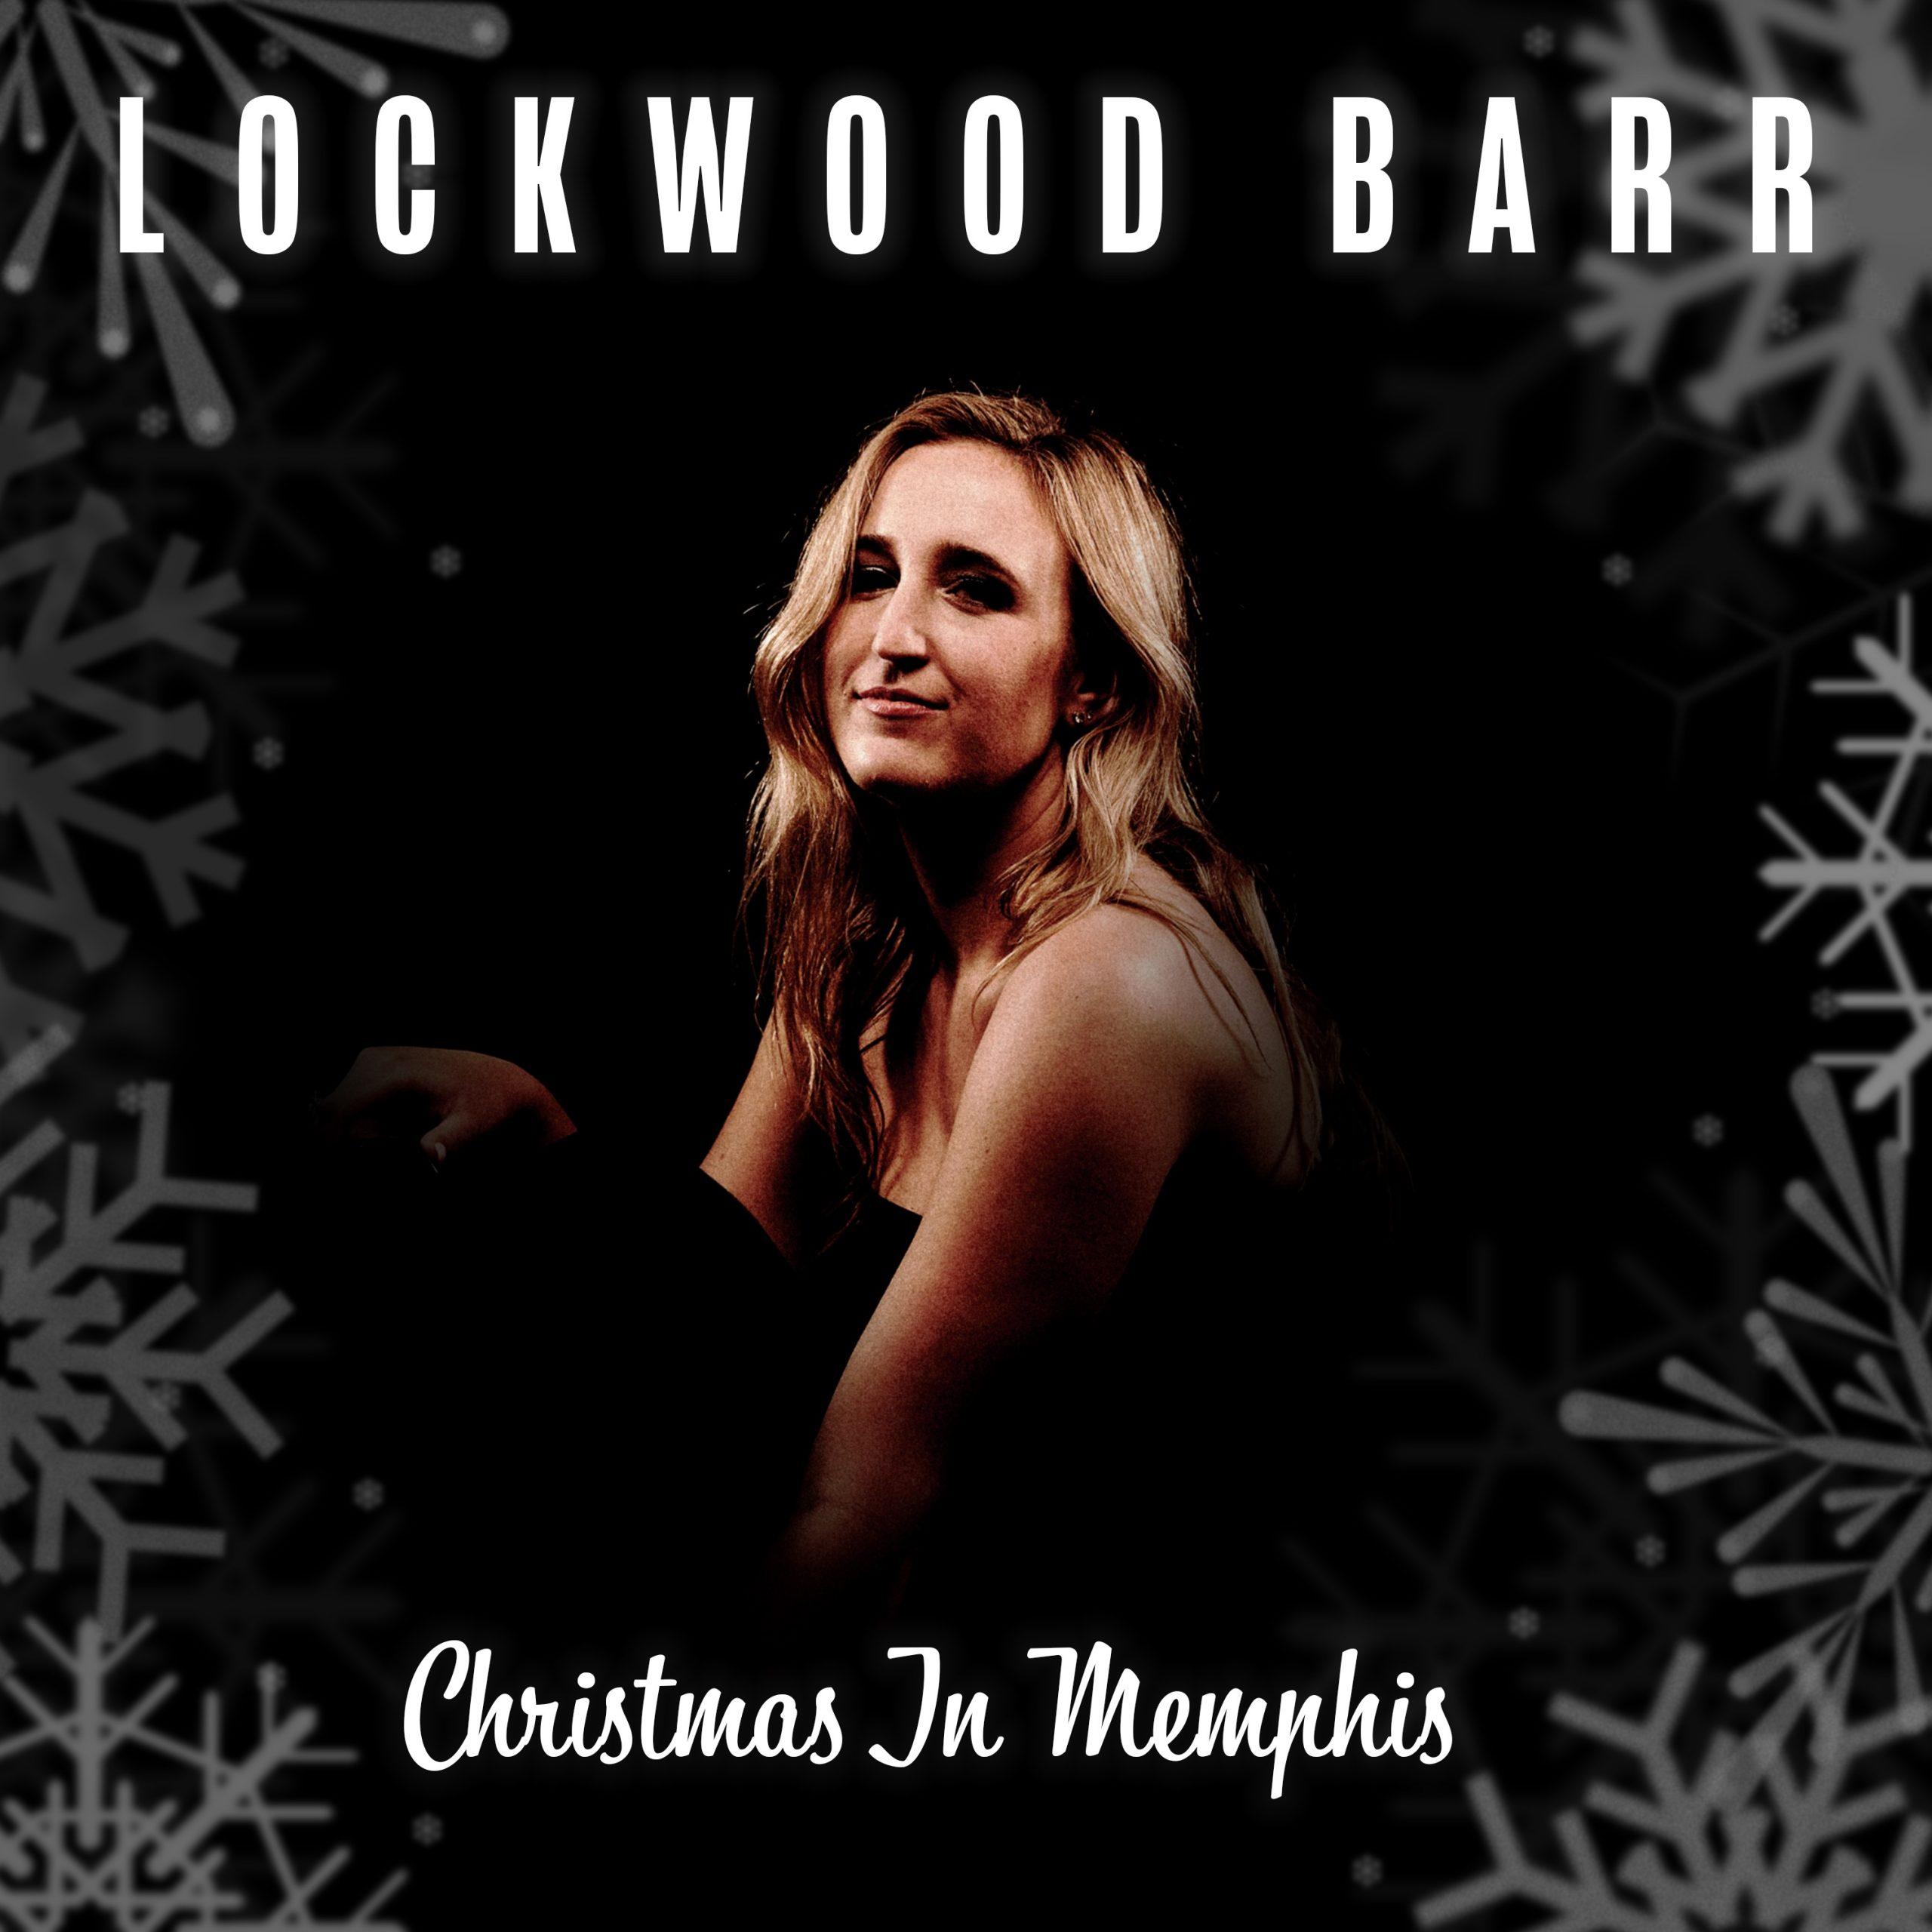 Lockwood Barr & Barrett Baber